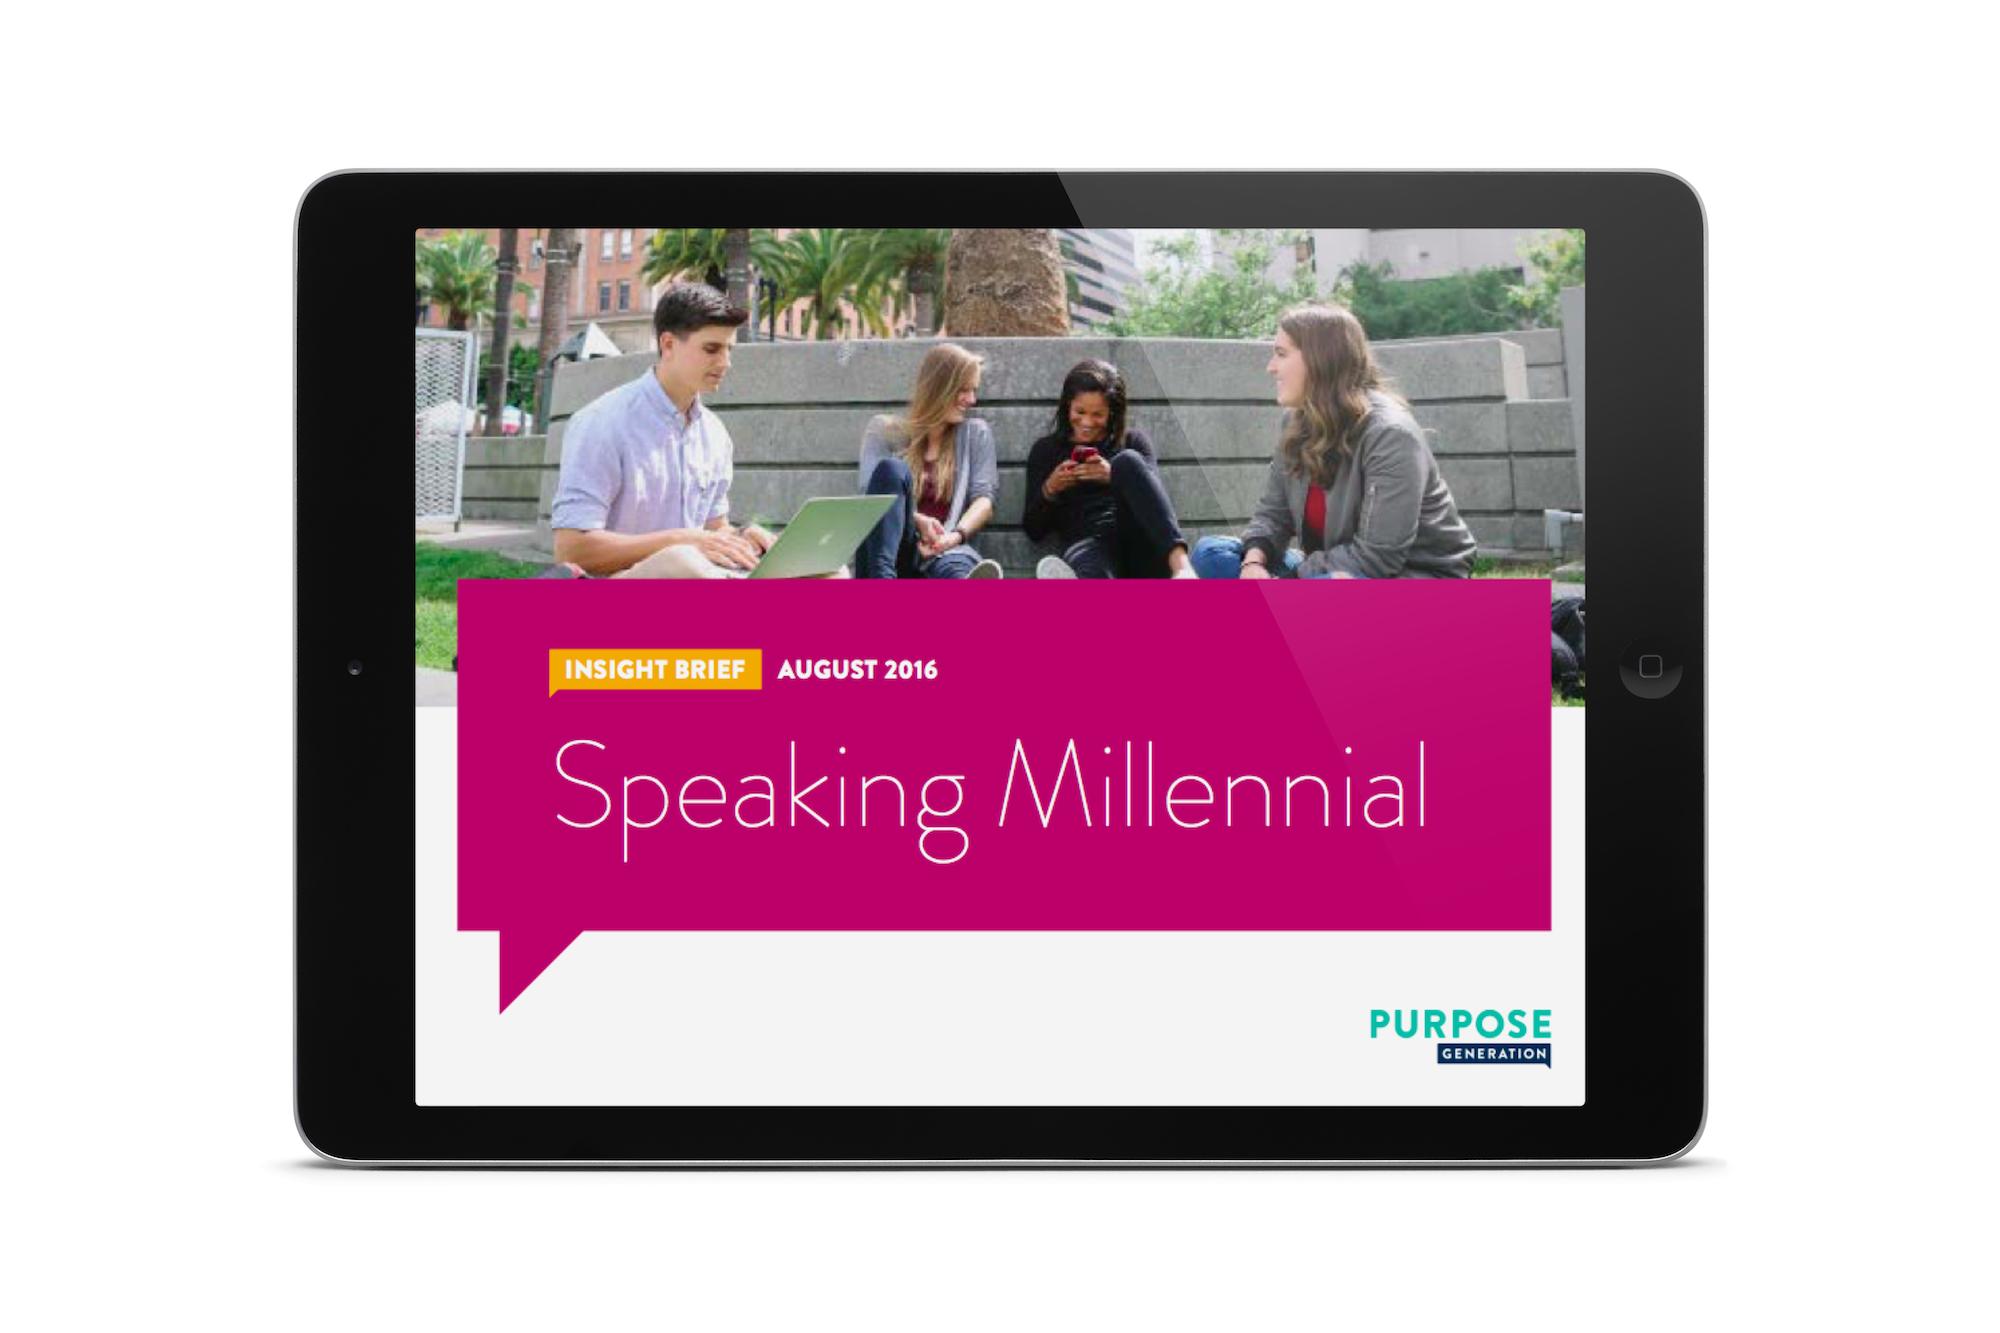 Speakinng Millennial